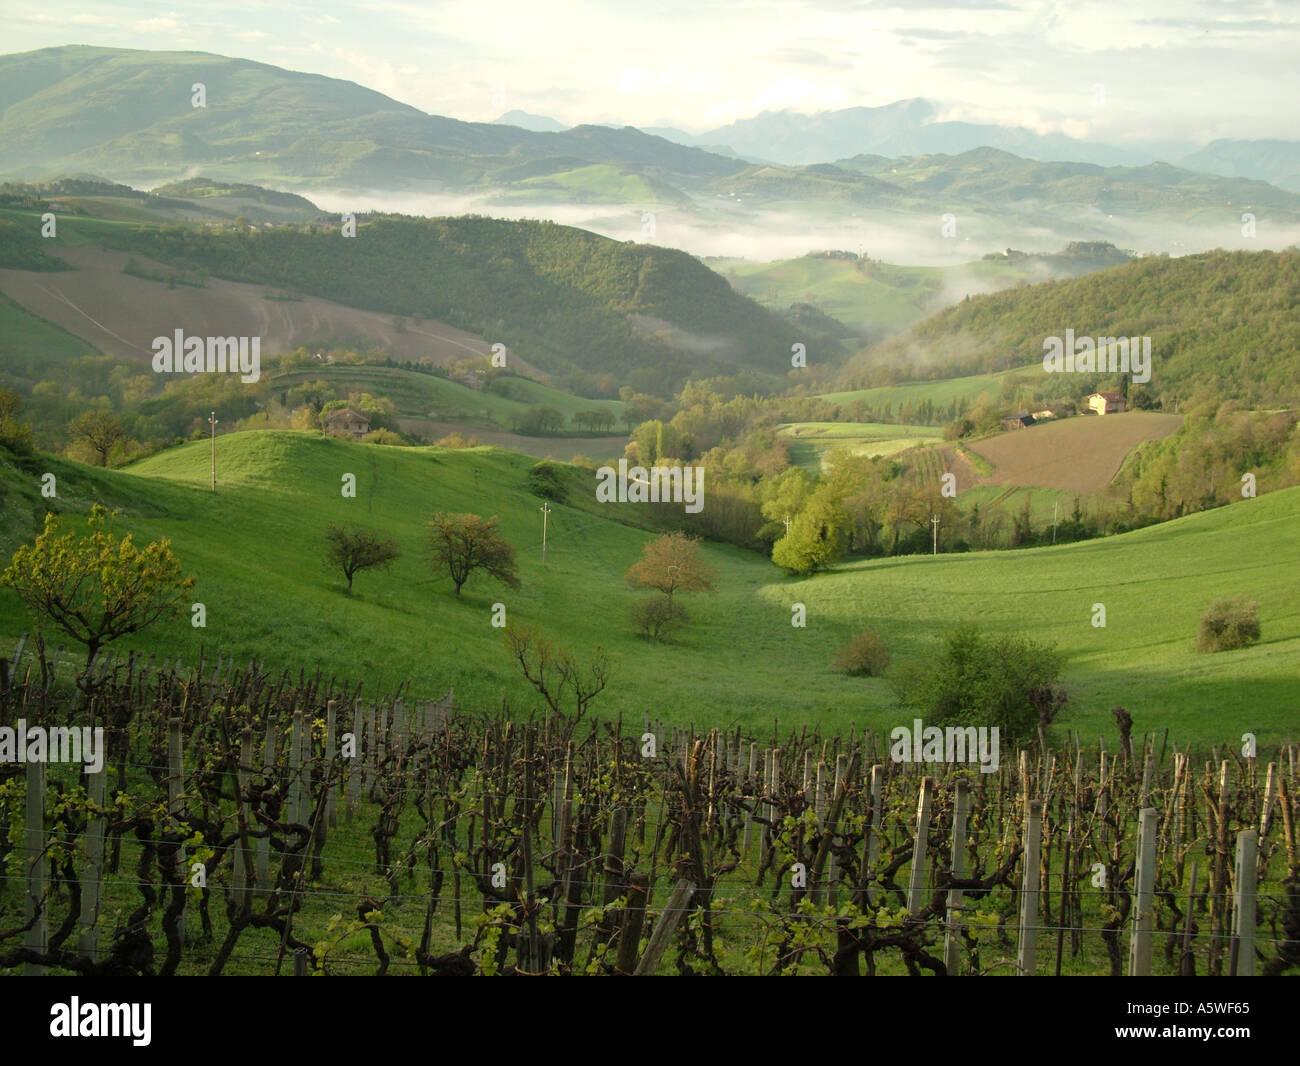 AJD36519, Marche, Italy, Urbino, Europe - Stock Image